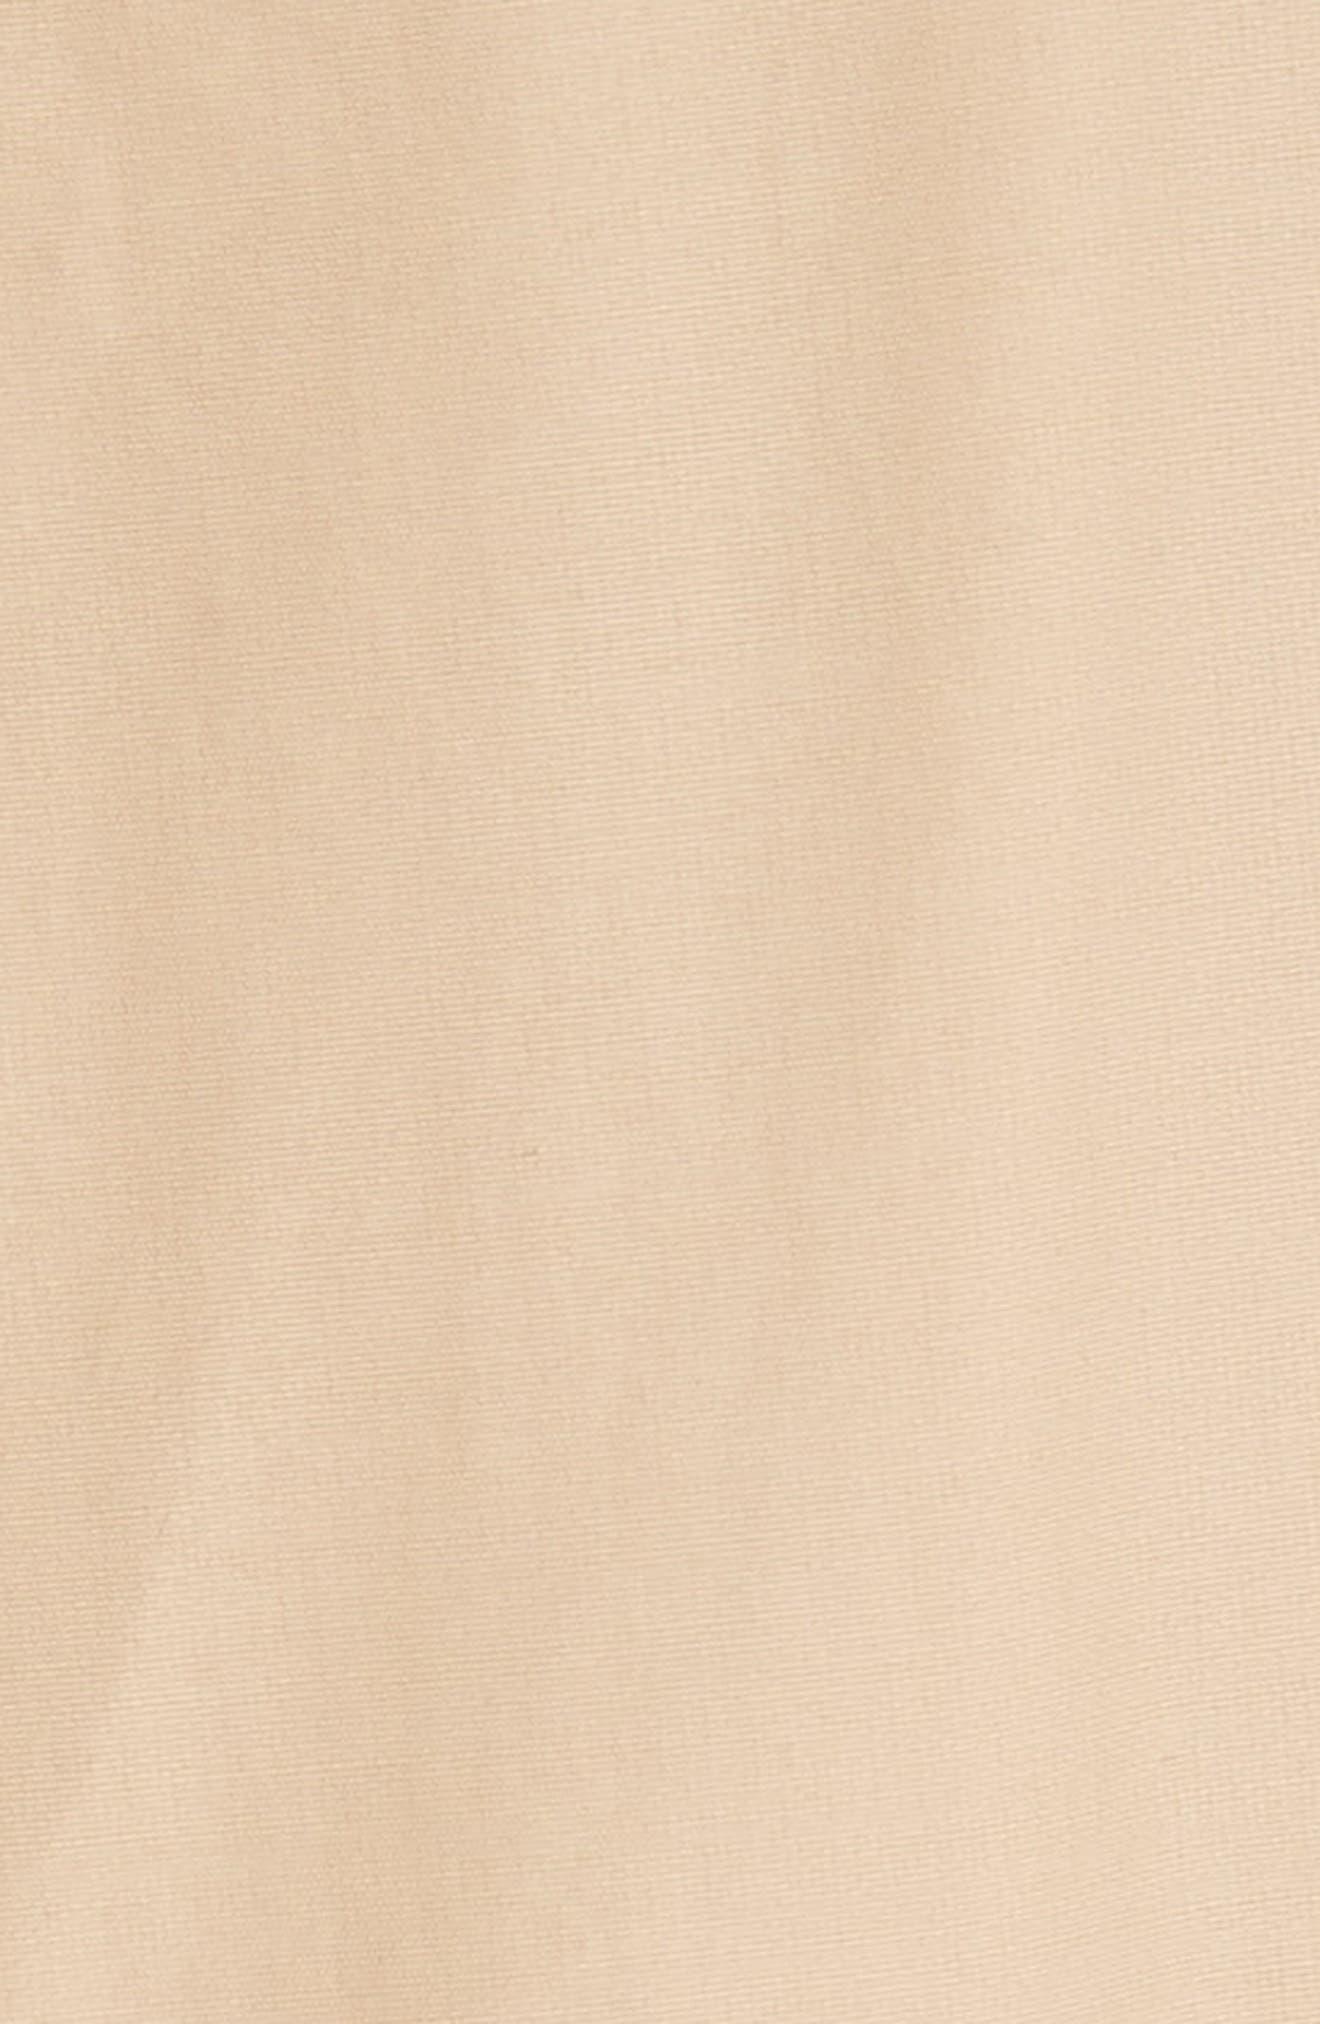 Round Sleeve Coat with Polka Dot Back Panel,                             Alternate thumbnail 6, color,